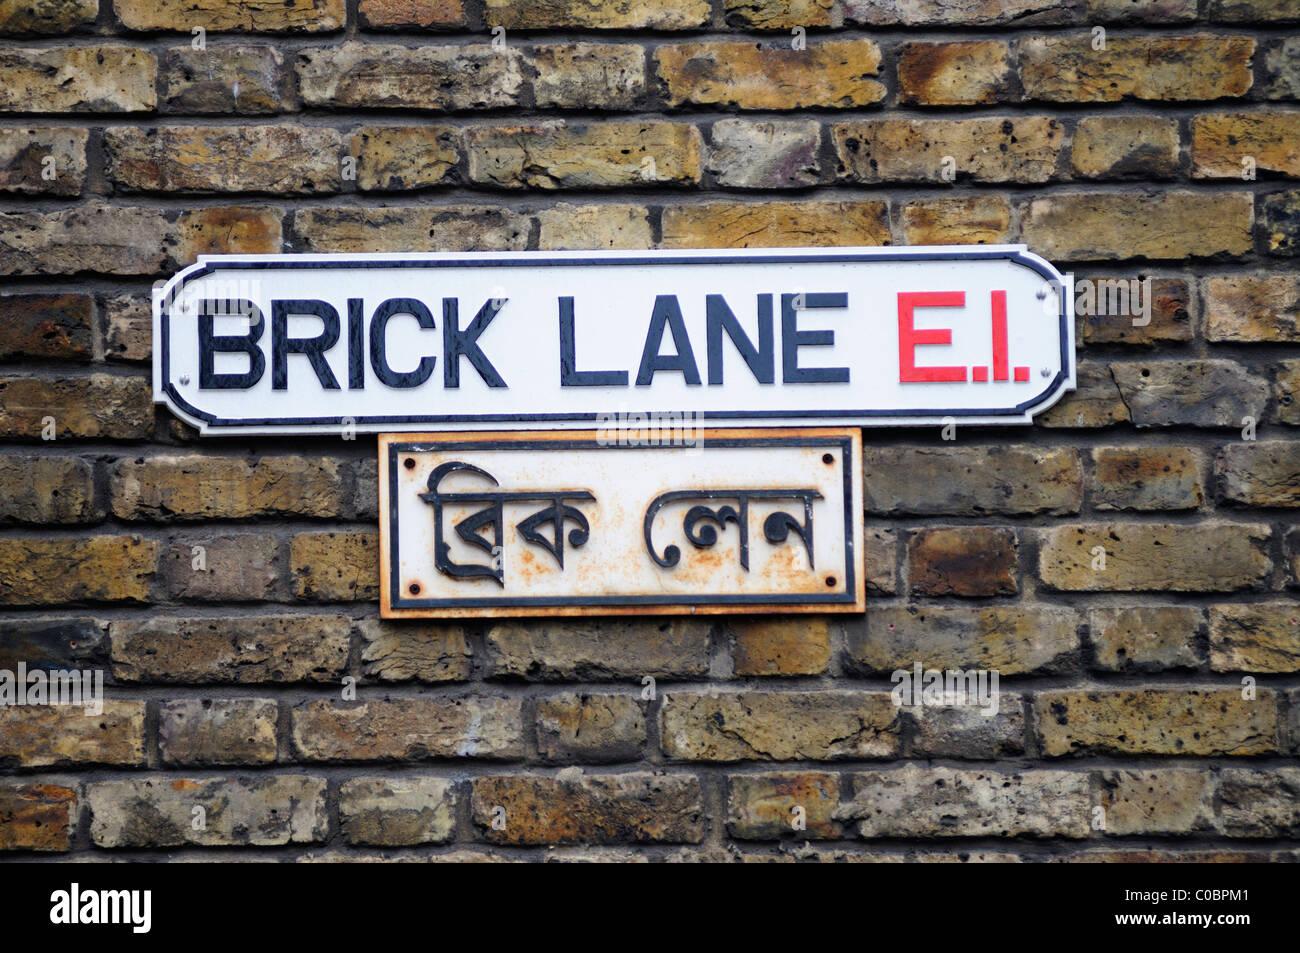 Bilingual Brick Lane E1 street sign, London, England, Uk Stock Photo